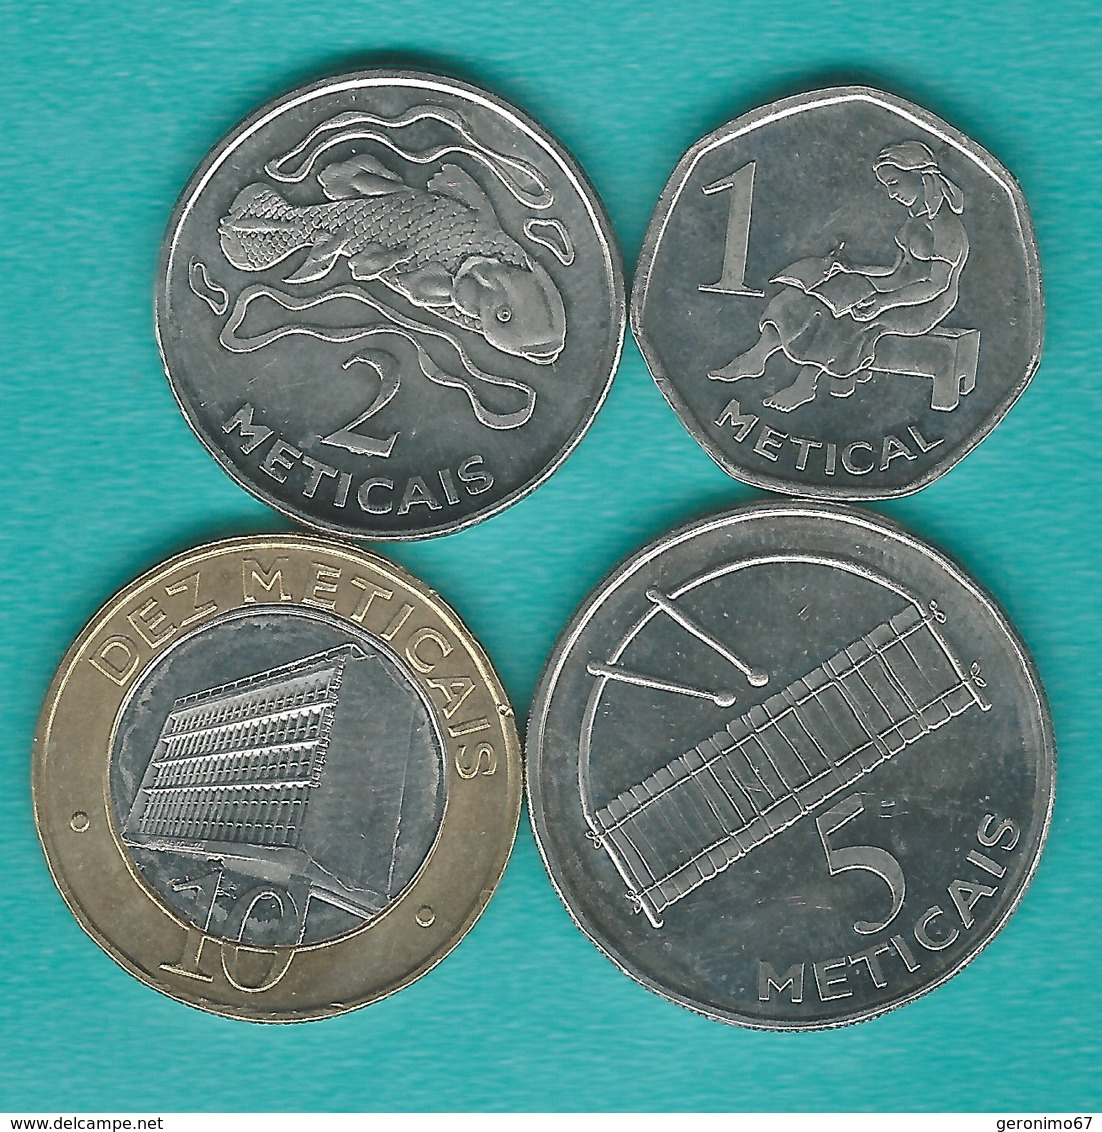 Mozambique - 2006 - 1, 5, 10, 20 & 50 Centavos; 1, 2, 5 & 10 Meticais (KMs 132-140) - Mozambique